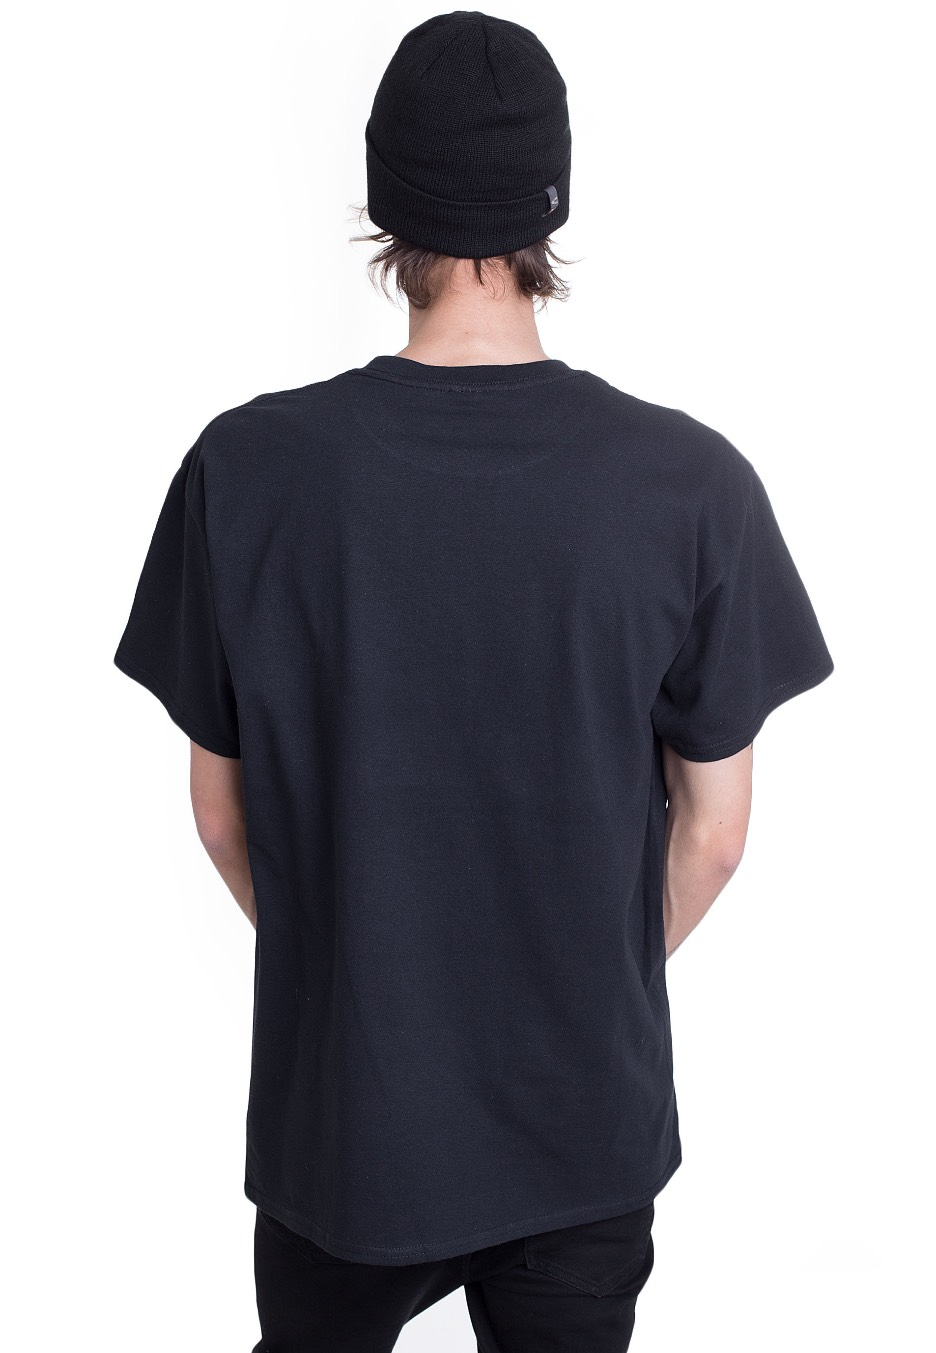 chelsea grin mothfly t shirt official deathcore merchandise shop worldwide. Black Bedroom Furniture Sets. Home Design Ideas